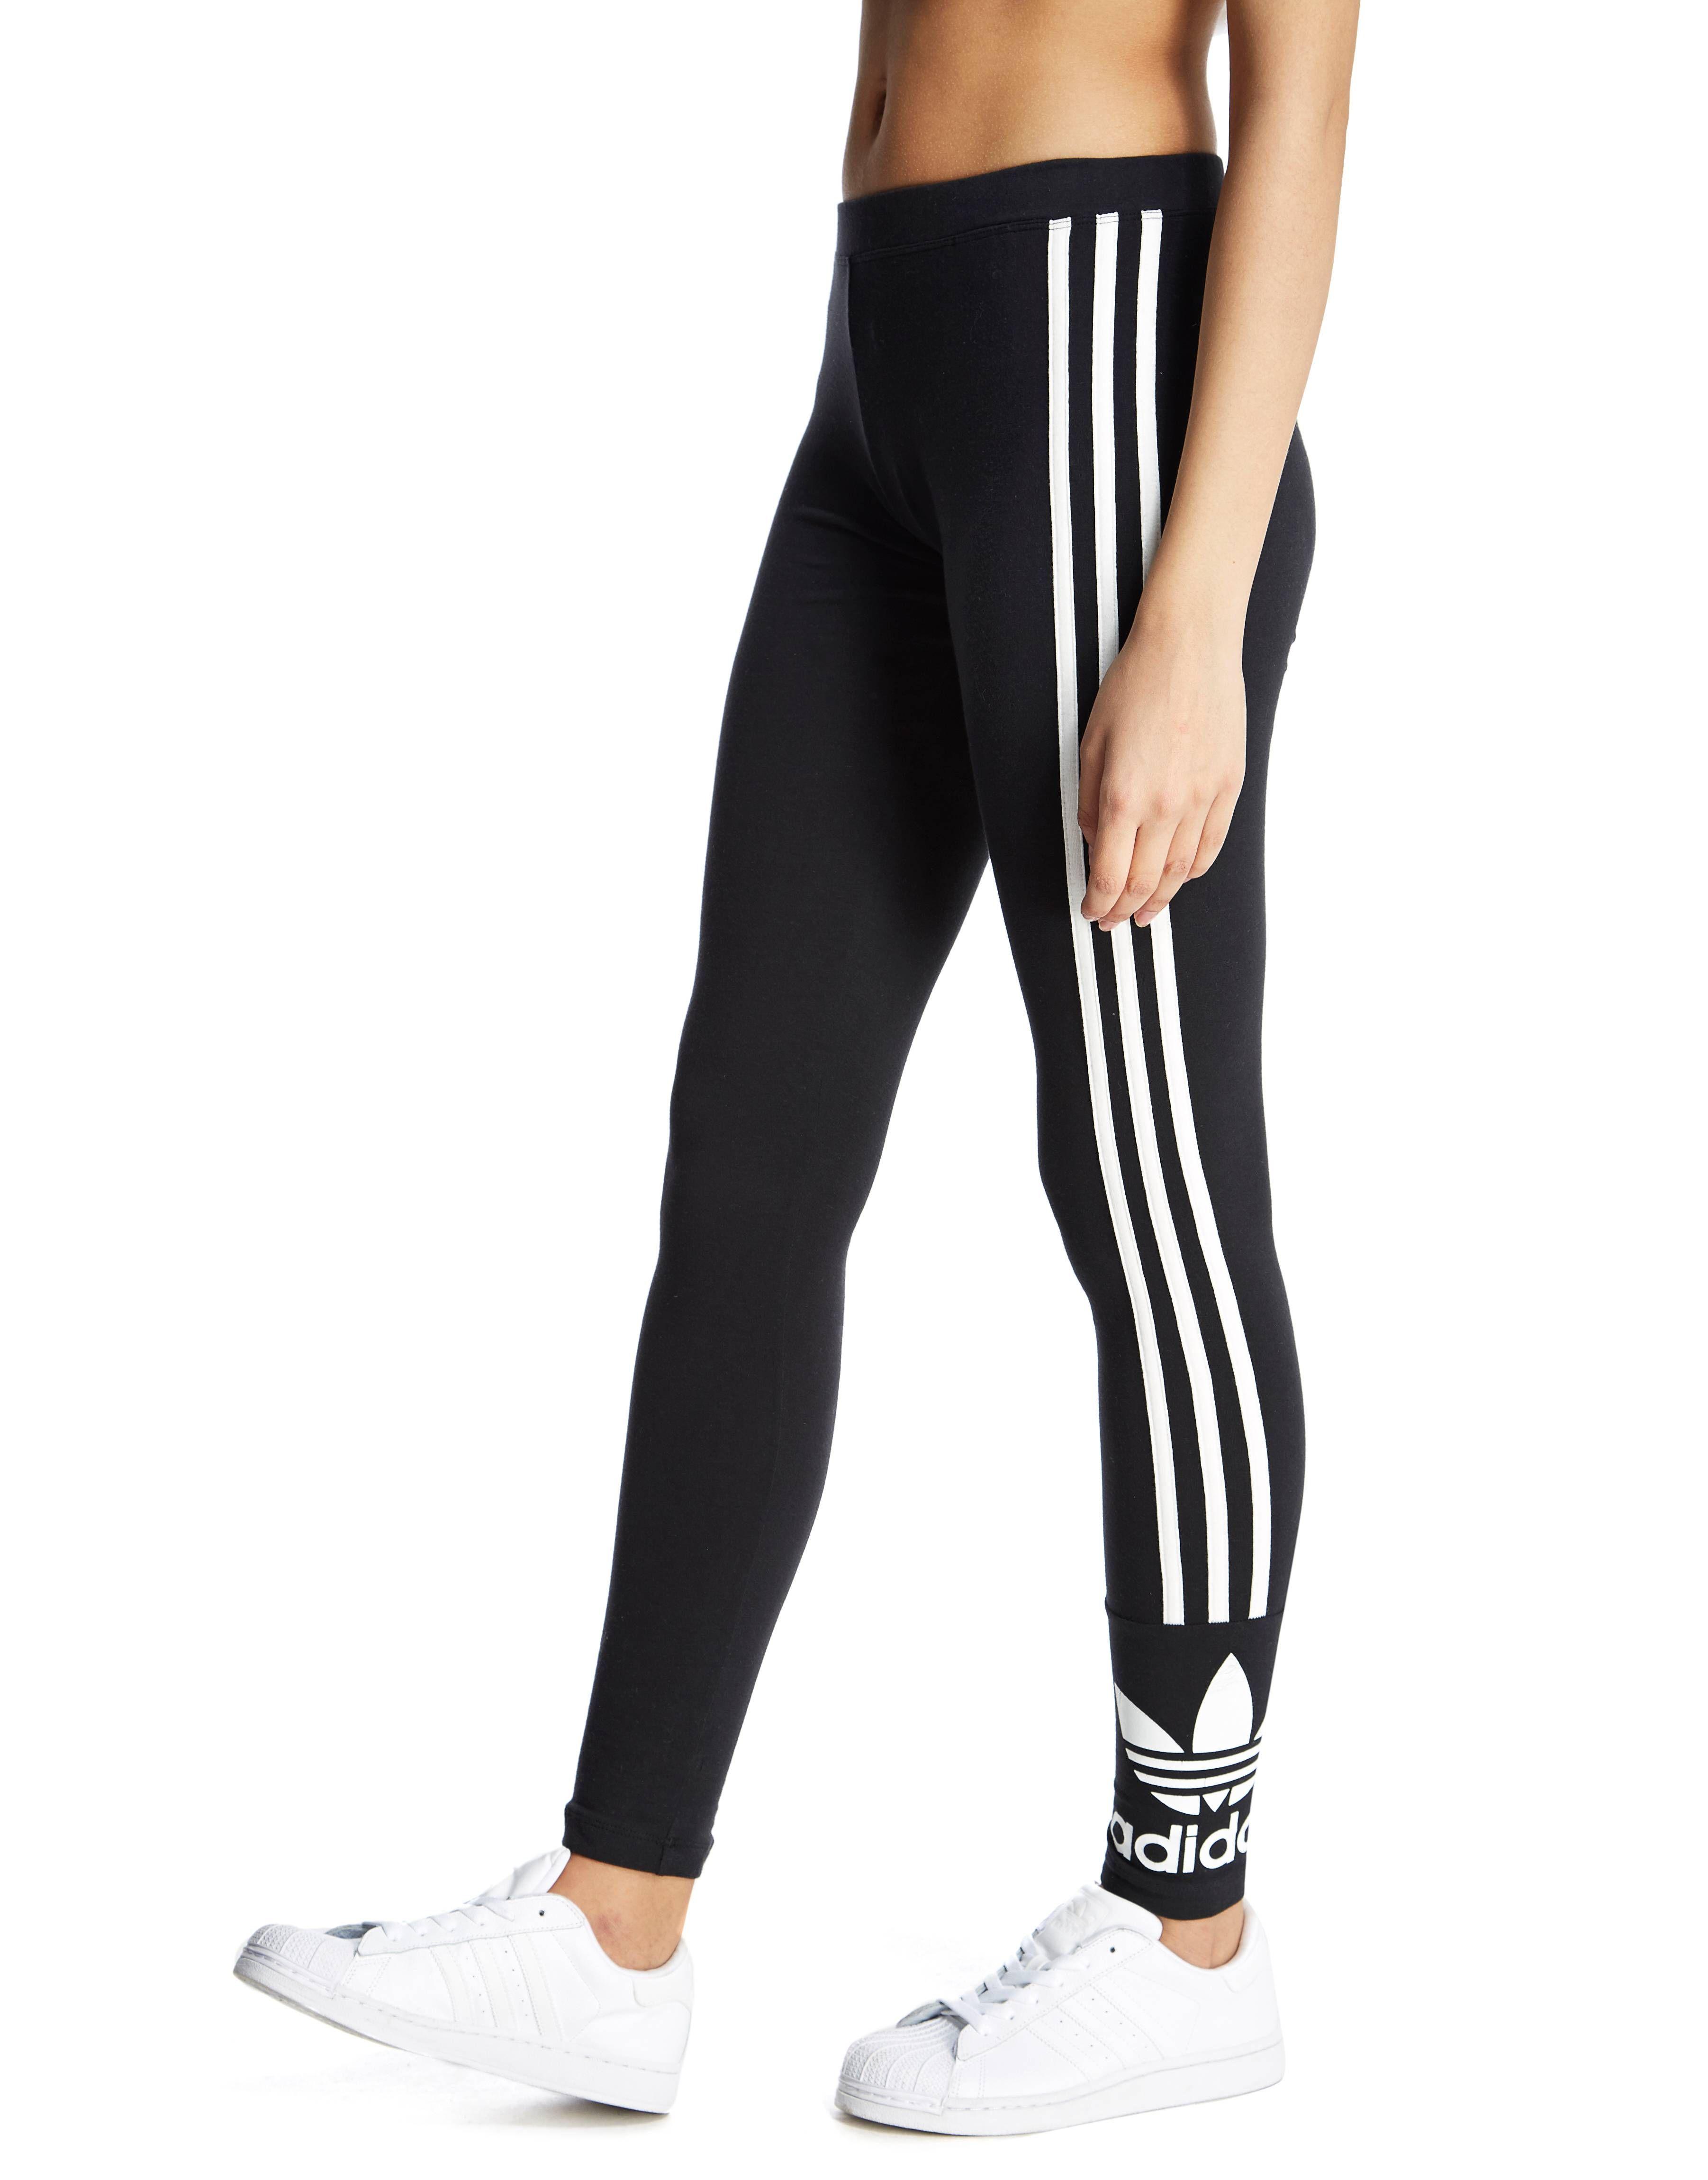 ed1b122f4a4a9 adidas Originals 3 Stripe Trefoil Leggings - Shoppa adidas Originals 3  Stripe Trefoil Leggings online hos JD Sports, Storbritanniens ledande  sportmodebutik.